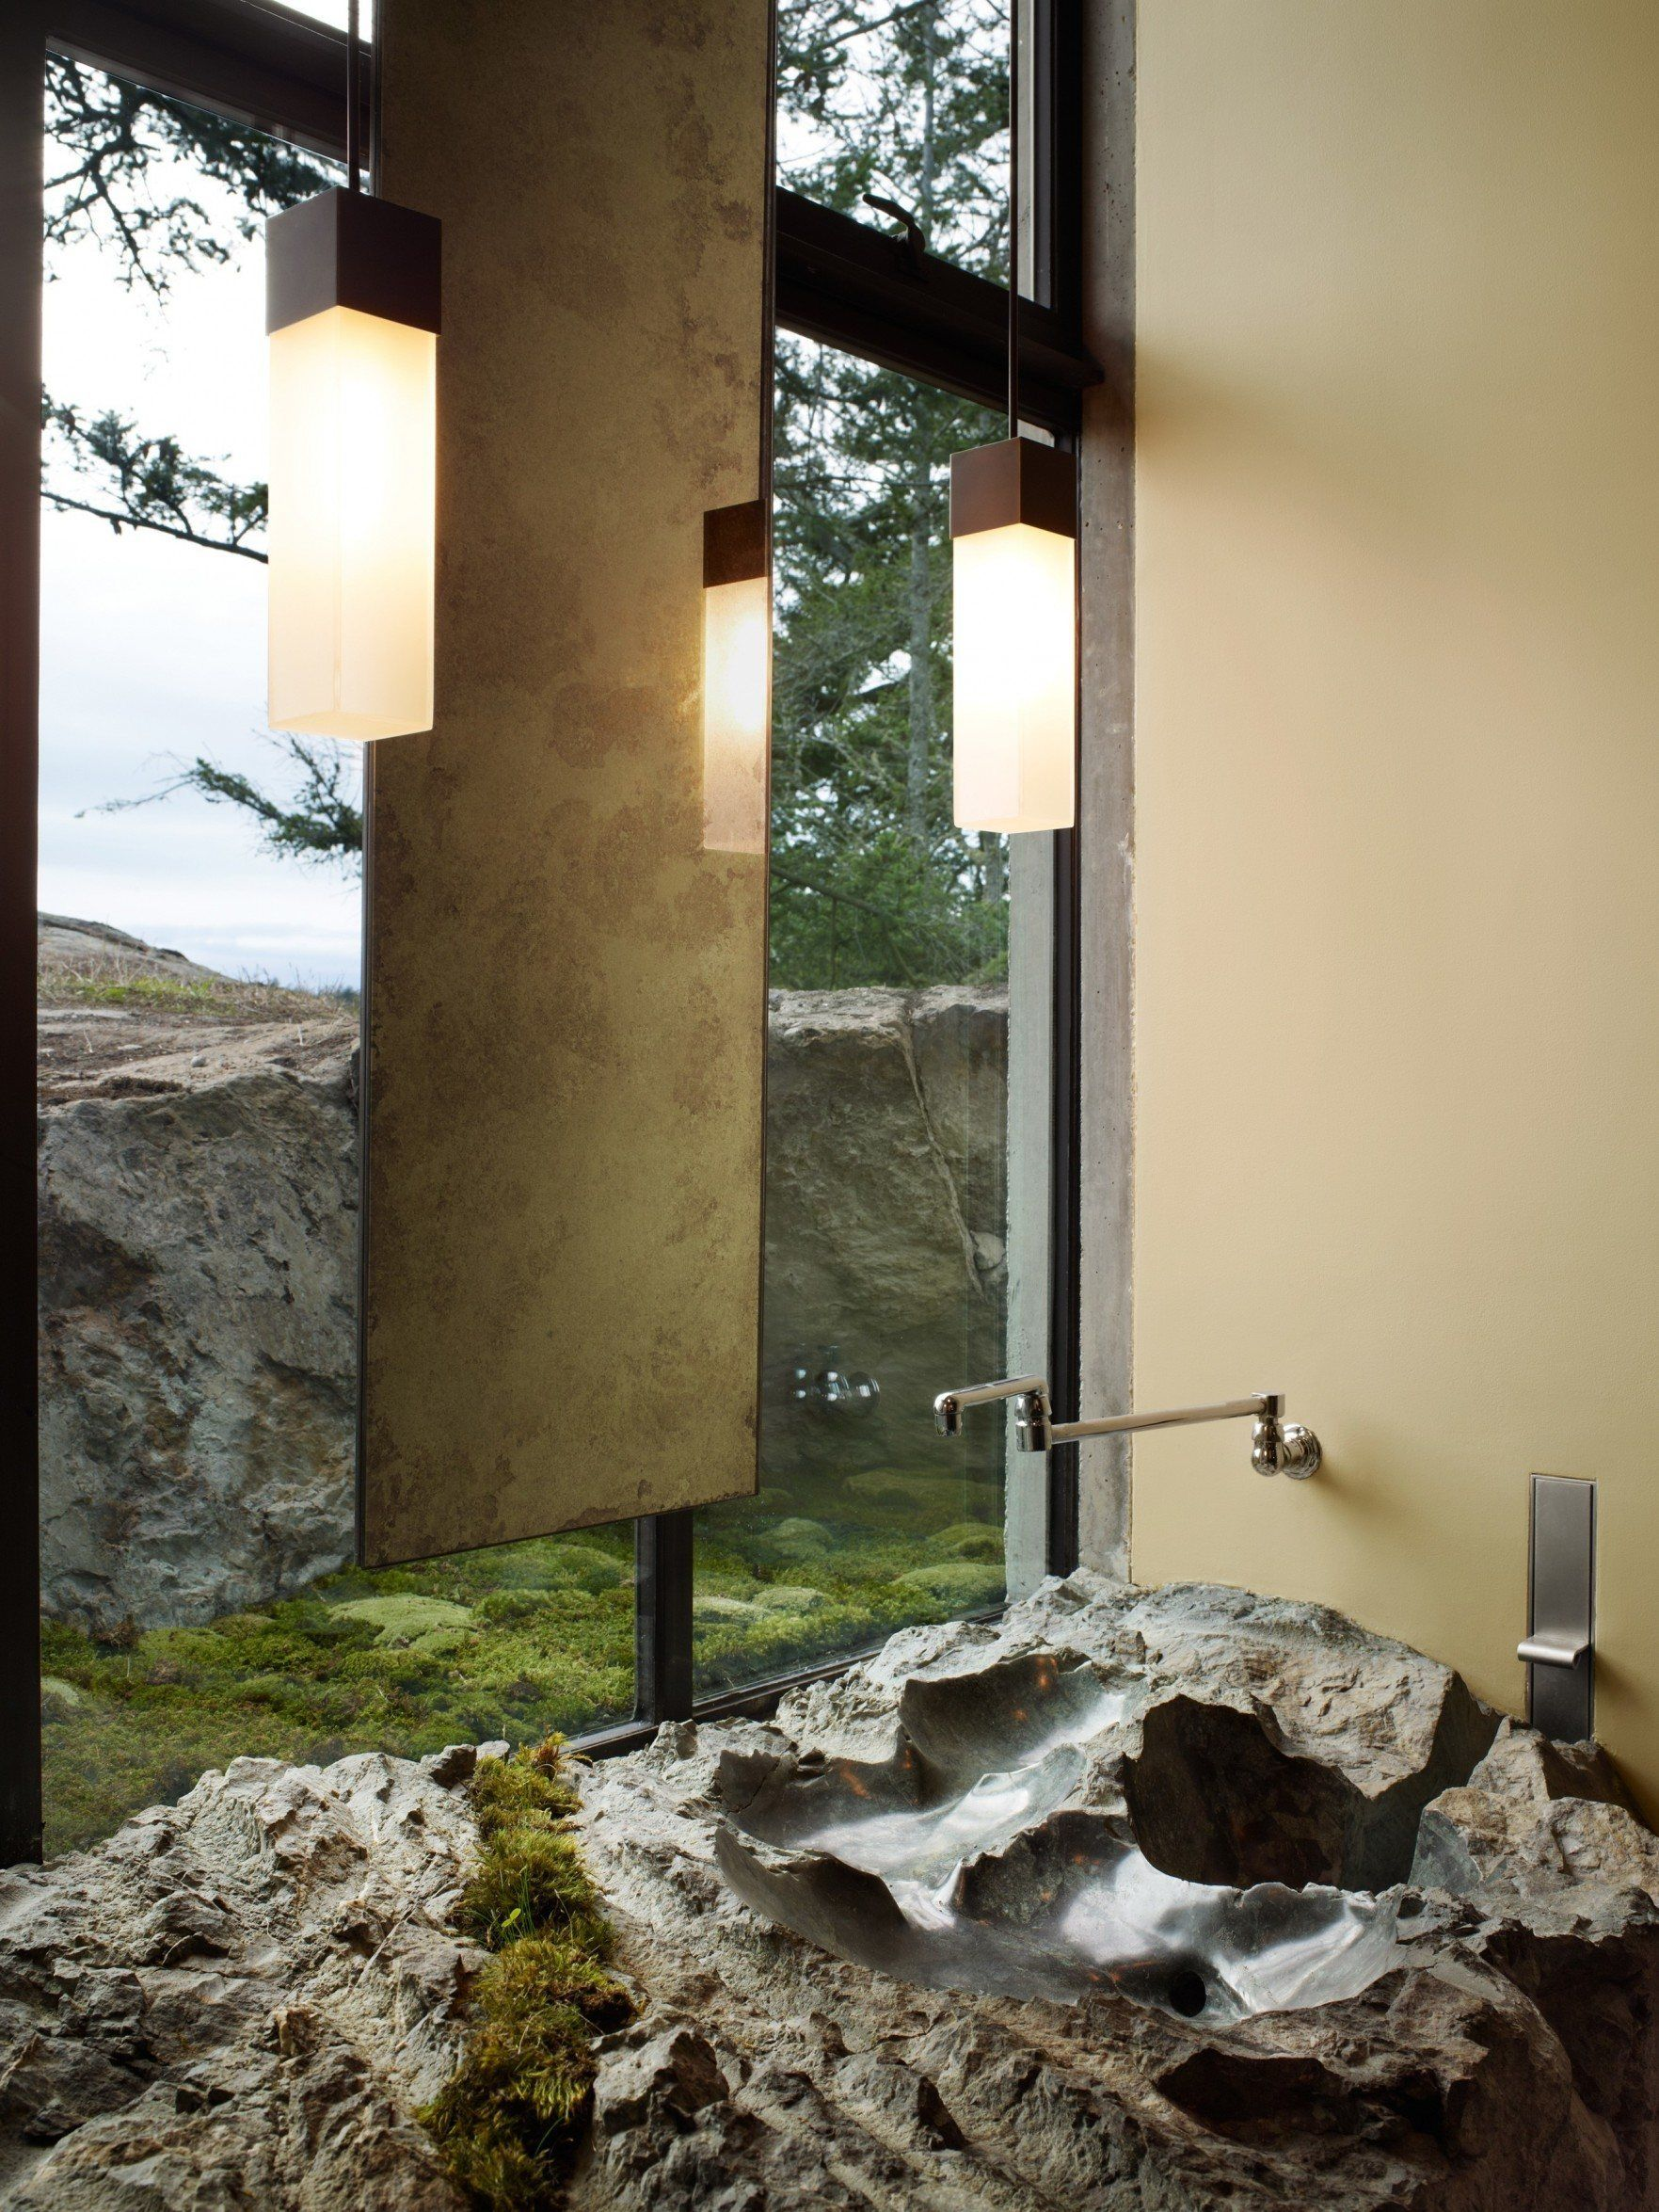 Pin by Alexander Vrolijk on Zukünftige Projekte Concrete